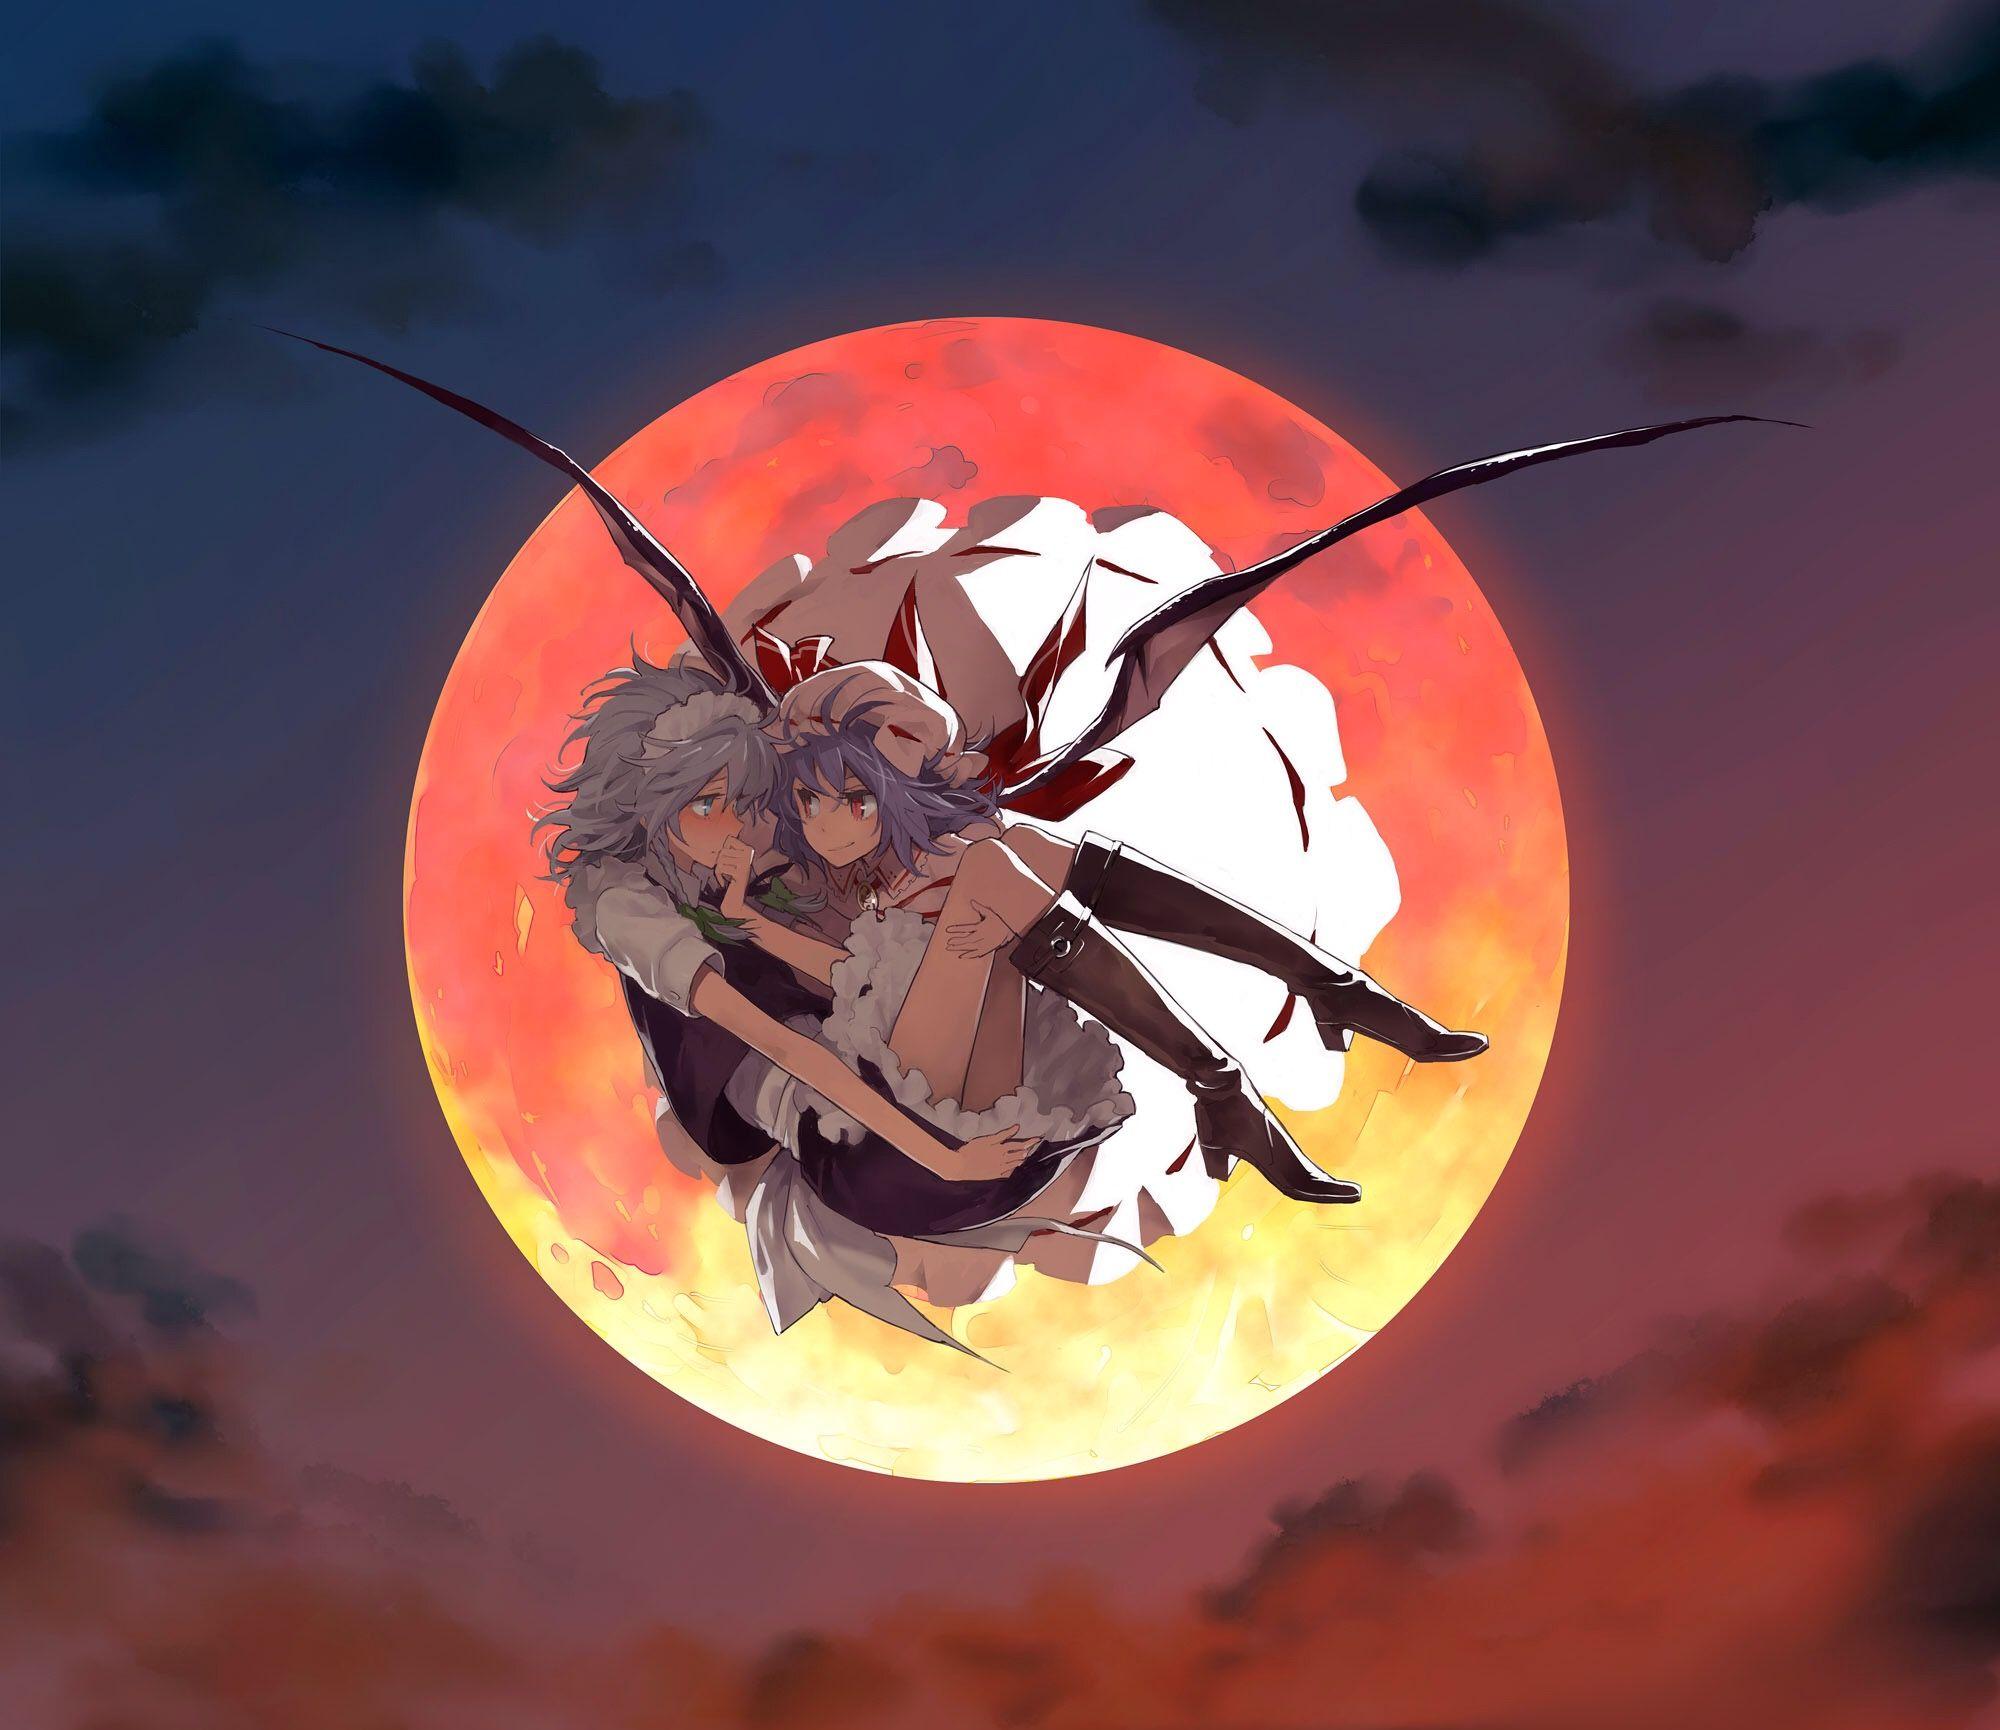 touhou おしゃれまとめの人気アイデア pinterest ココミク 咲夜 十六夜咲夜 東方 かわいい